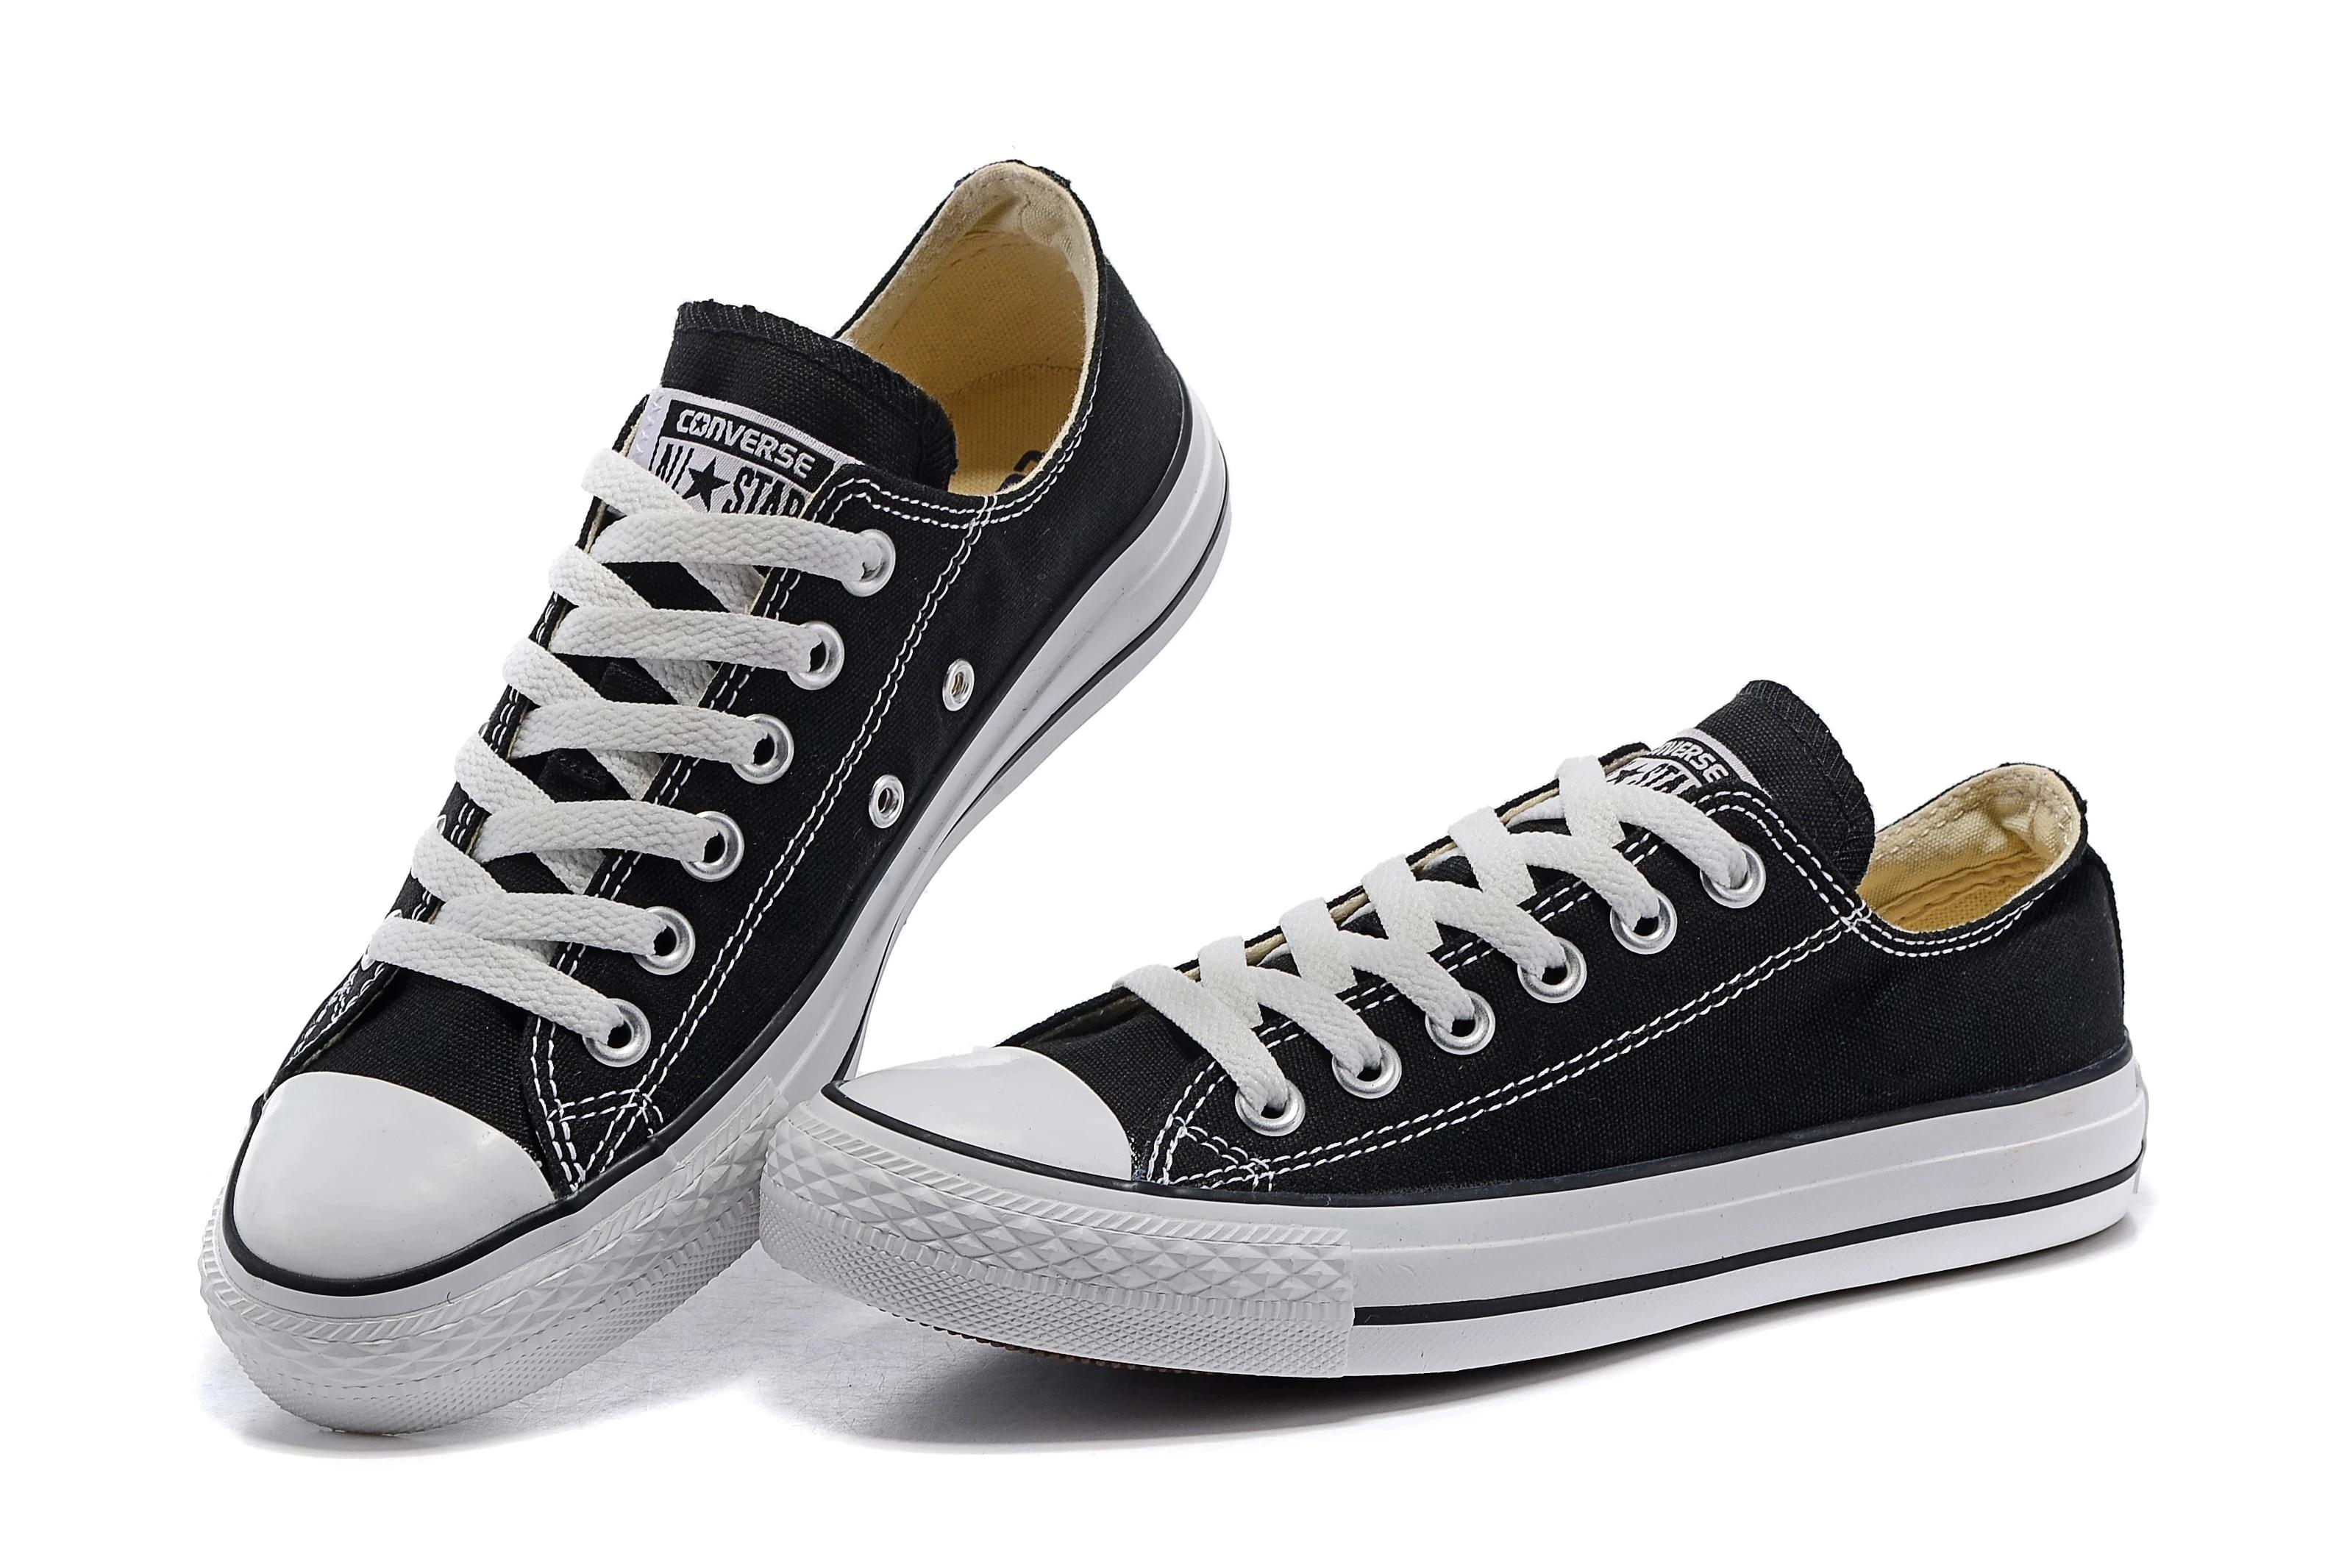 Women Luxury Sneakers Flat Lace Up Black Unisex Vulcanized Shoes Men Rubber Sole Casual Autumn Big S